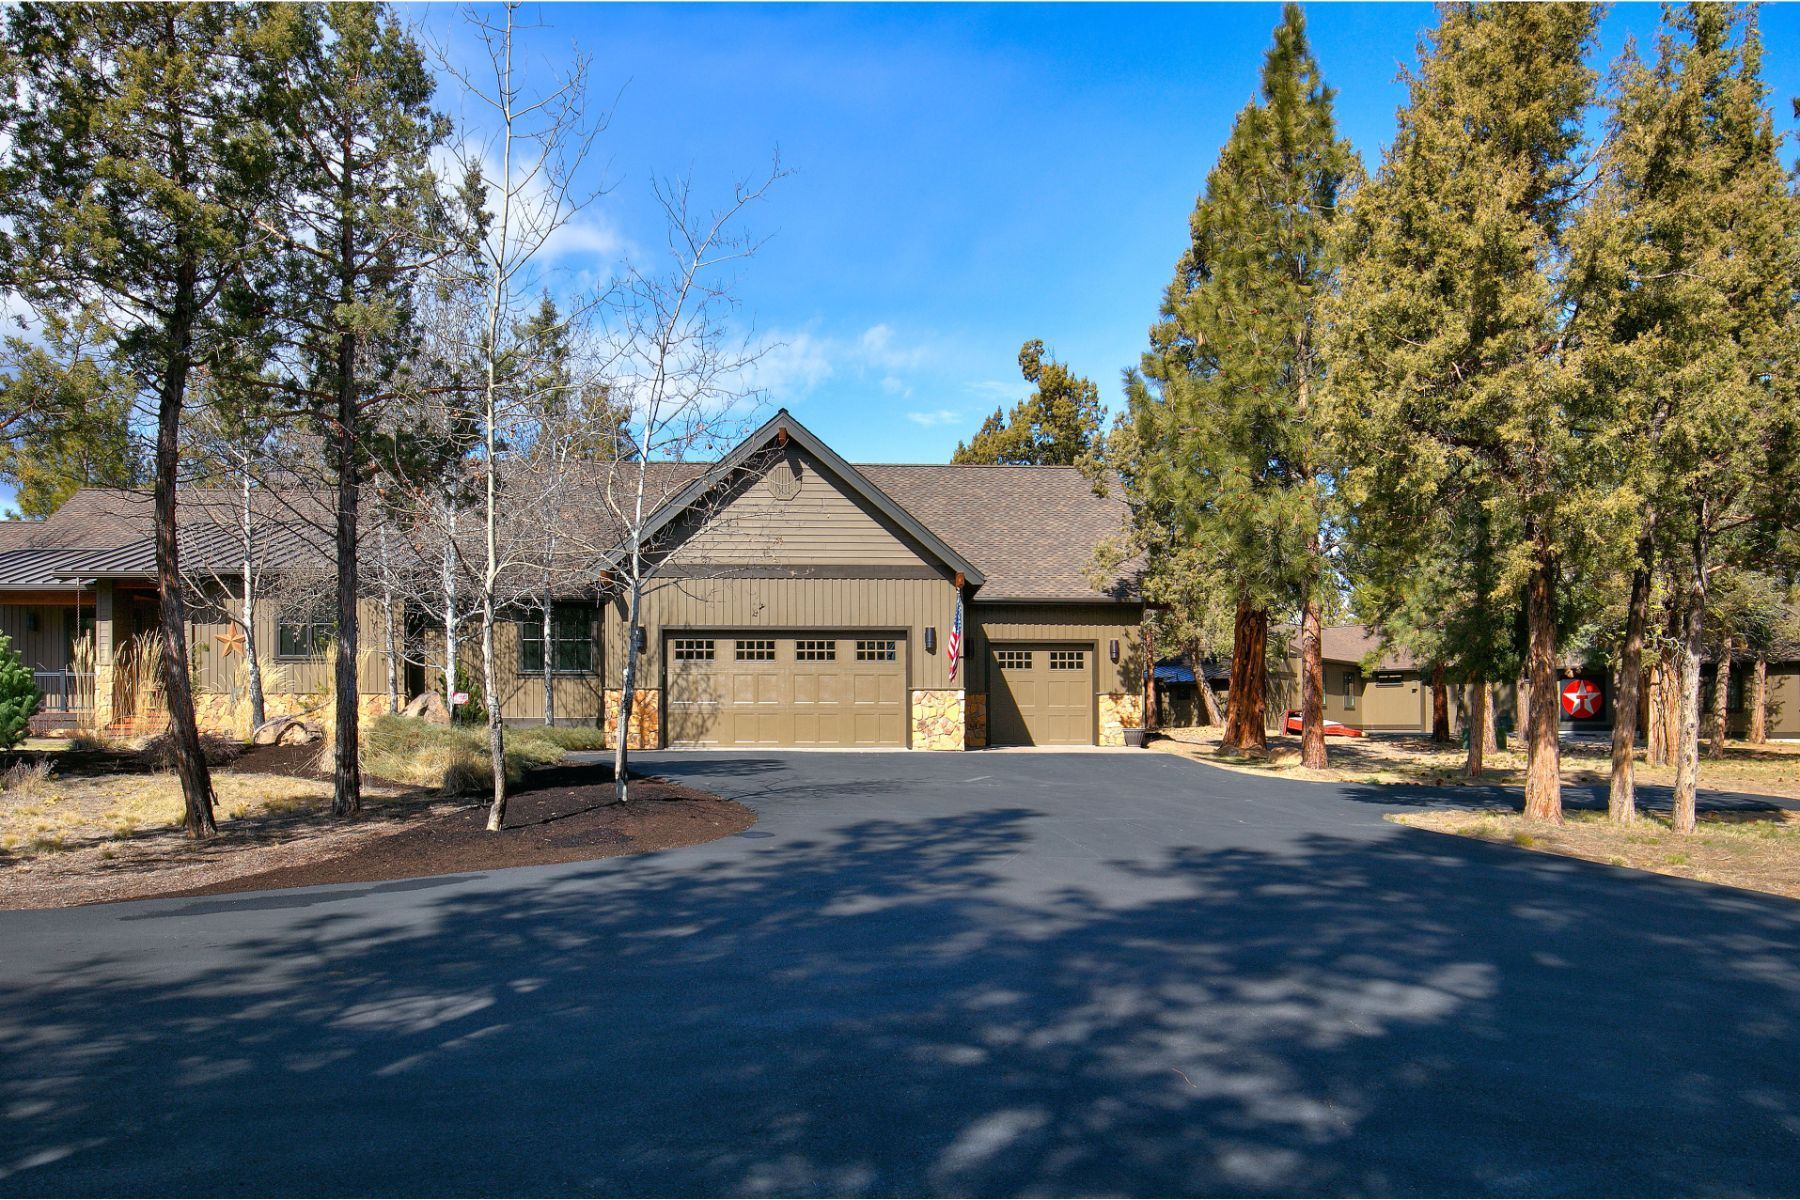 Other Residential Homes για την Πώληση στο 70197 Sorrell Drive Sisters, OR 97759 Sisters, Ορεγκον 97759 Ηνωμένες Πολιτείες